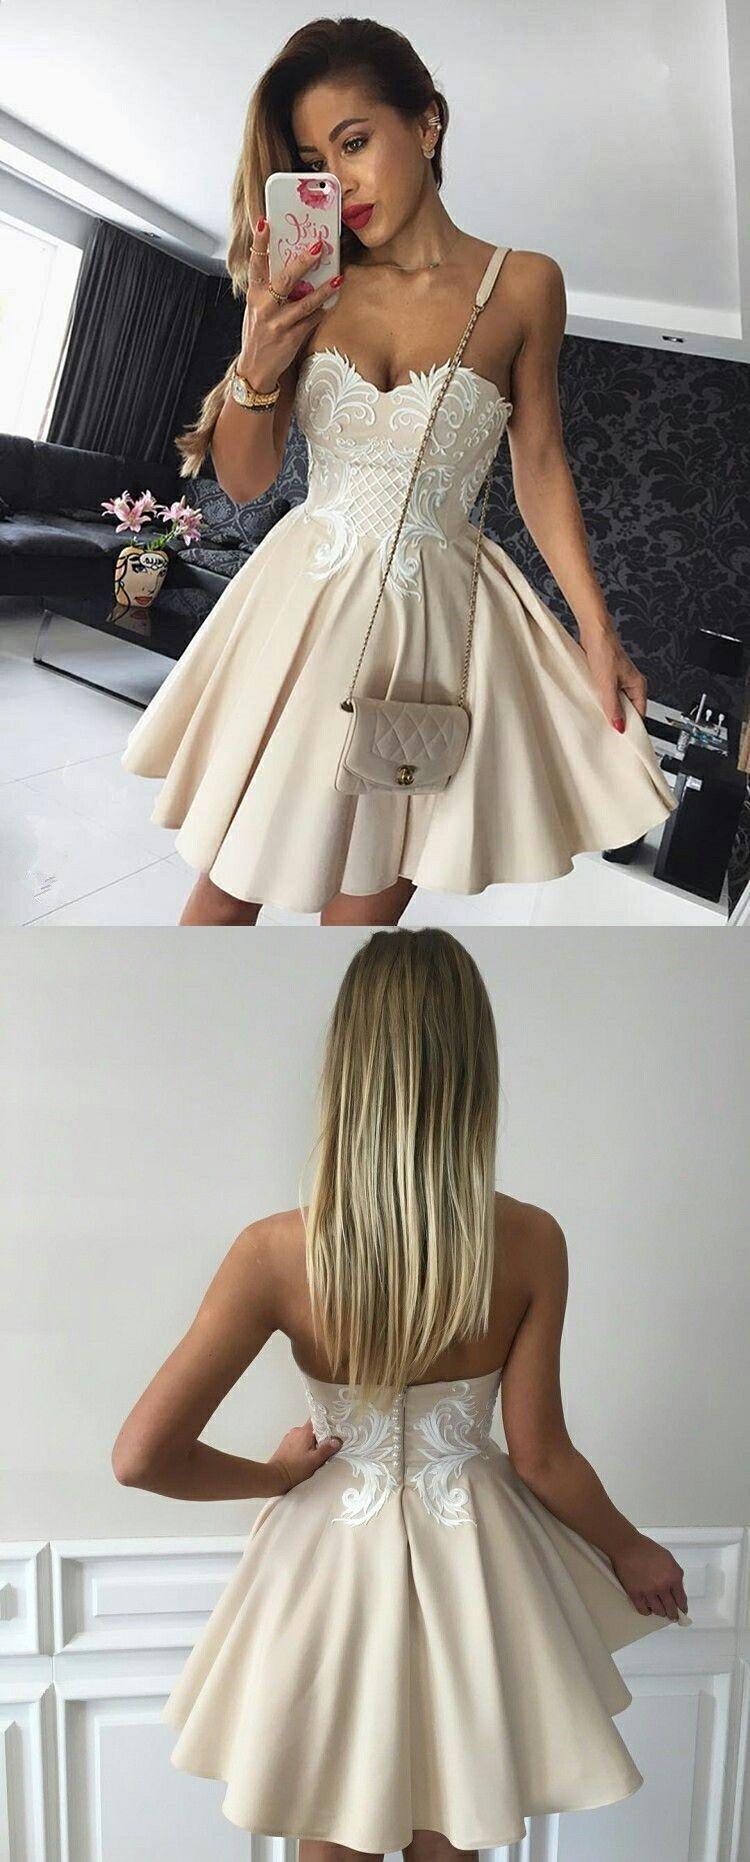 Aline sweetheart kneelength champagne satin homecoming dress with